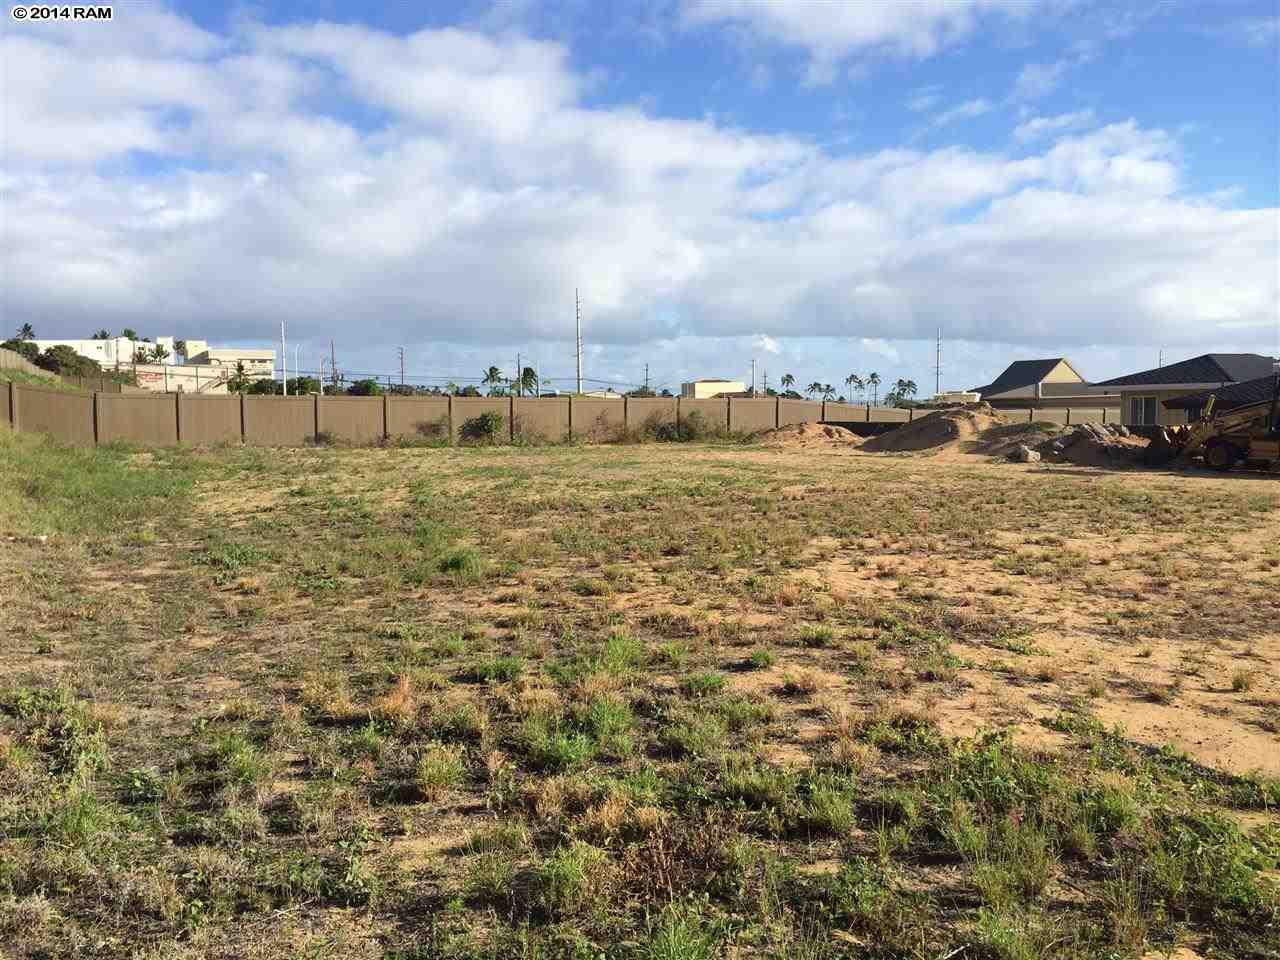 68 Keoneloa St Lot 31 Wailuku, Hi 96793 vacant land - photo 7 of 8